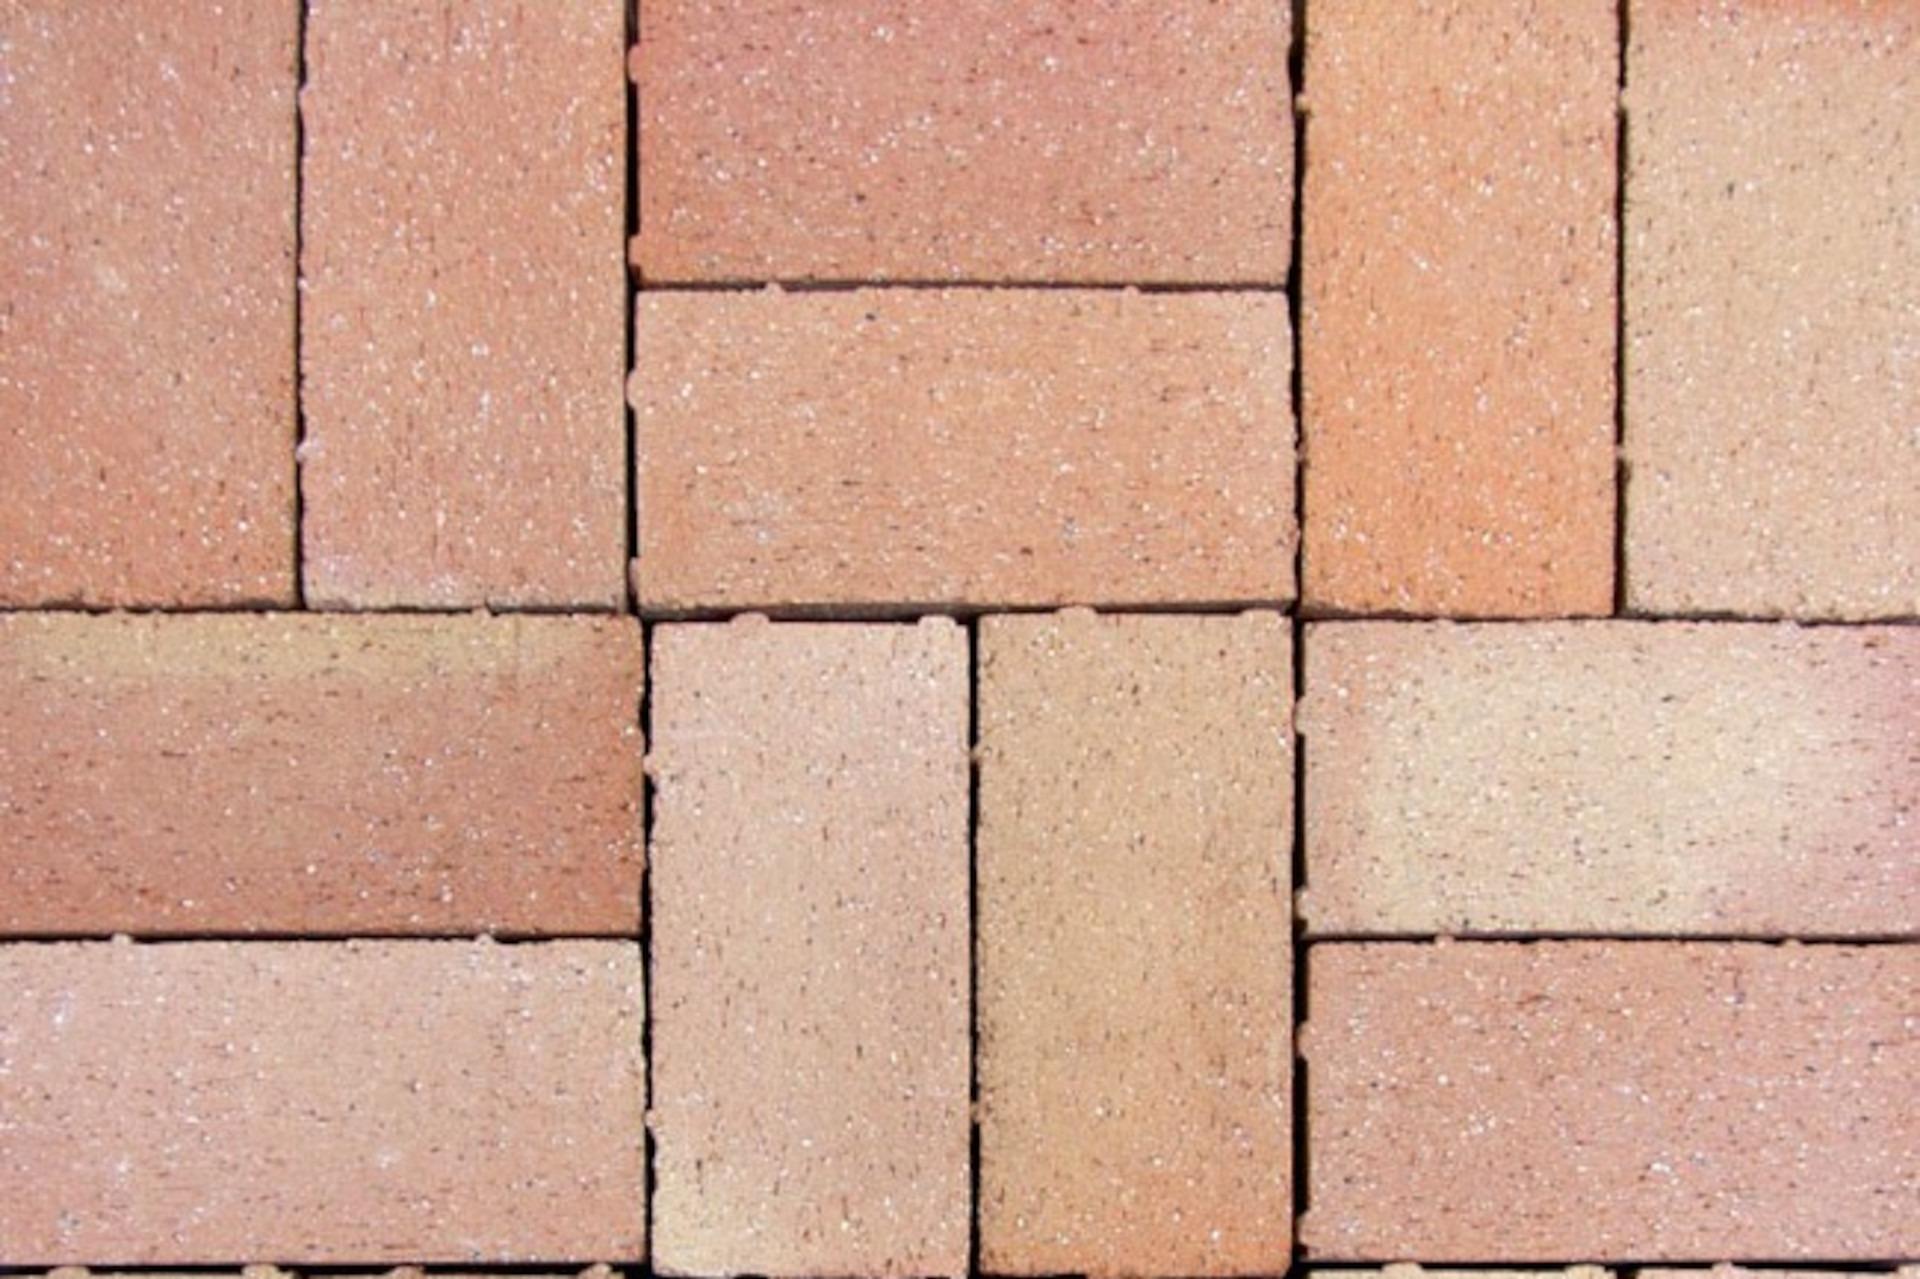 Desert Mirage Brick Pavers